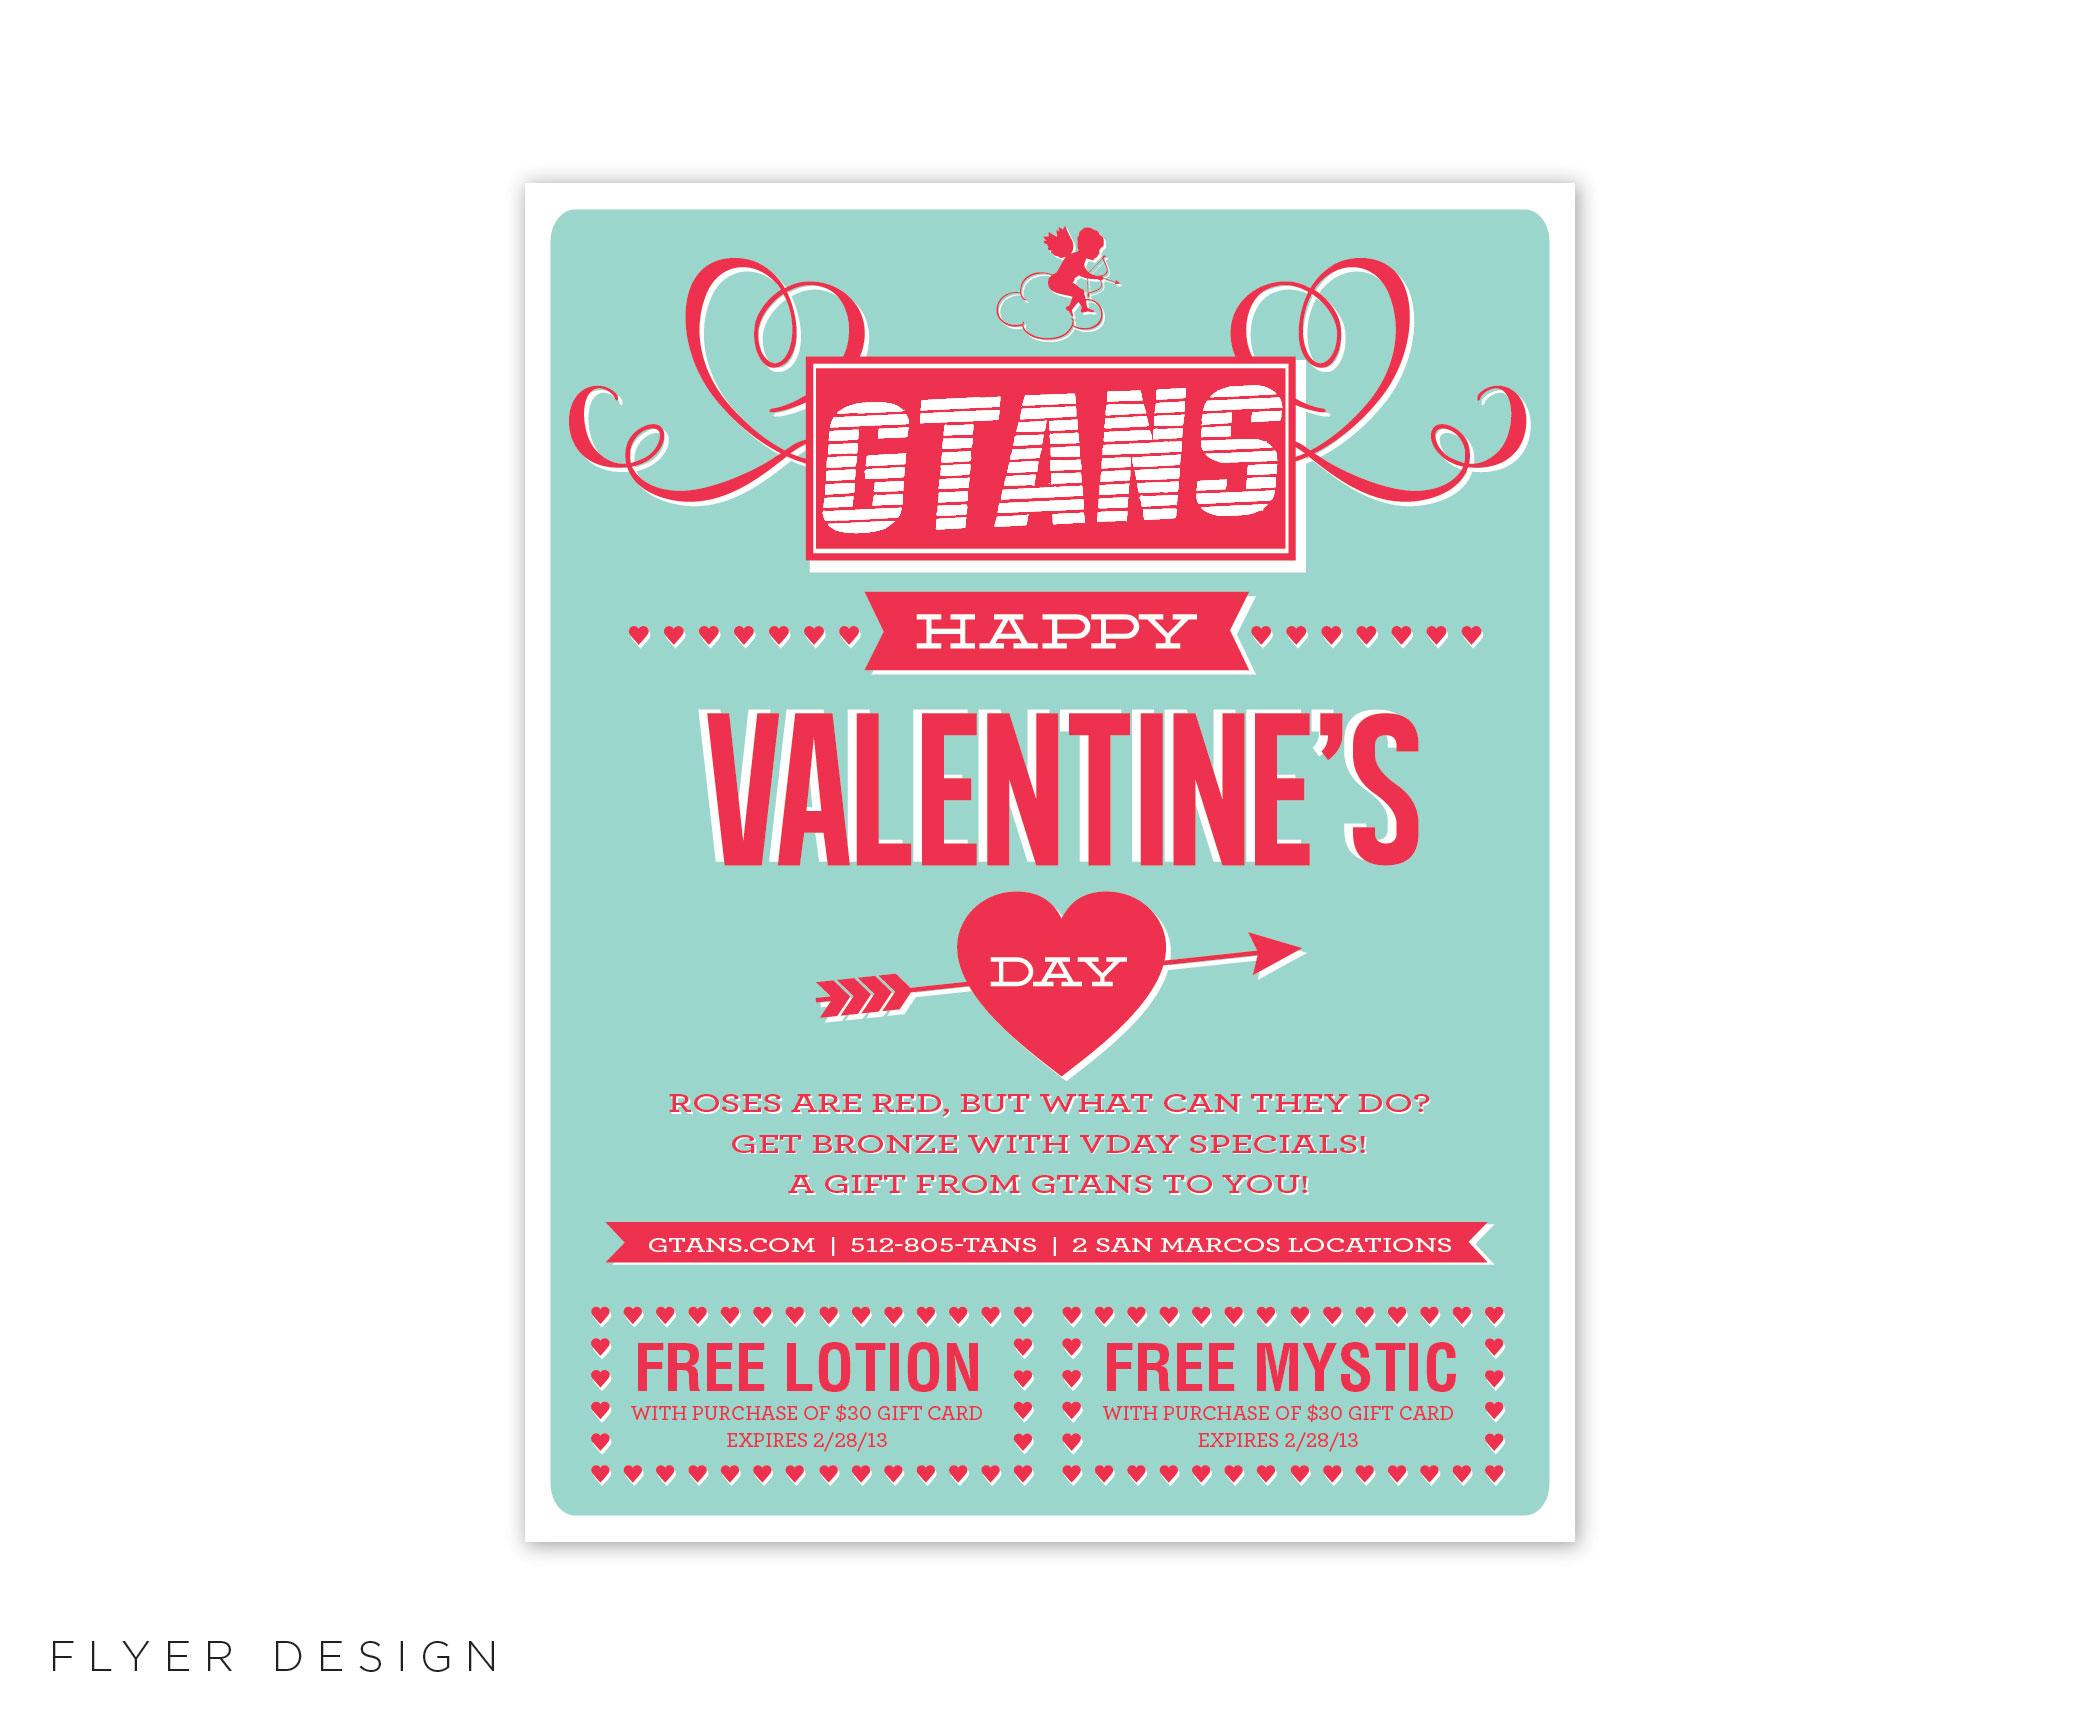 gtans-01.jpg